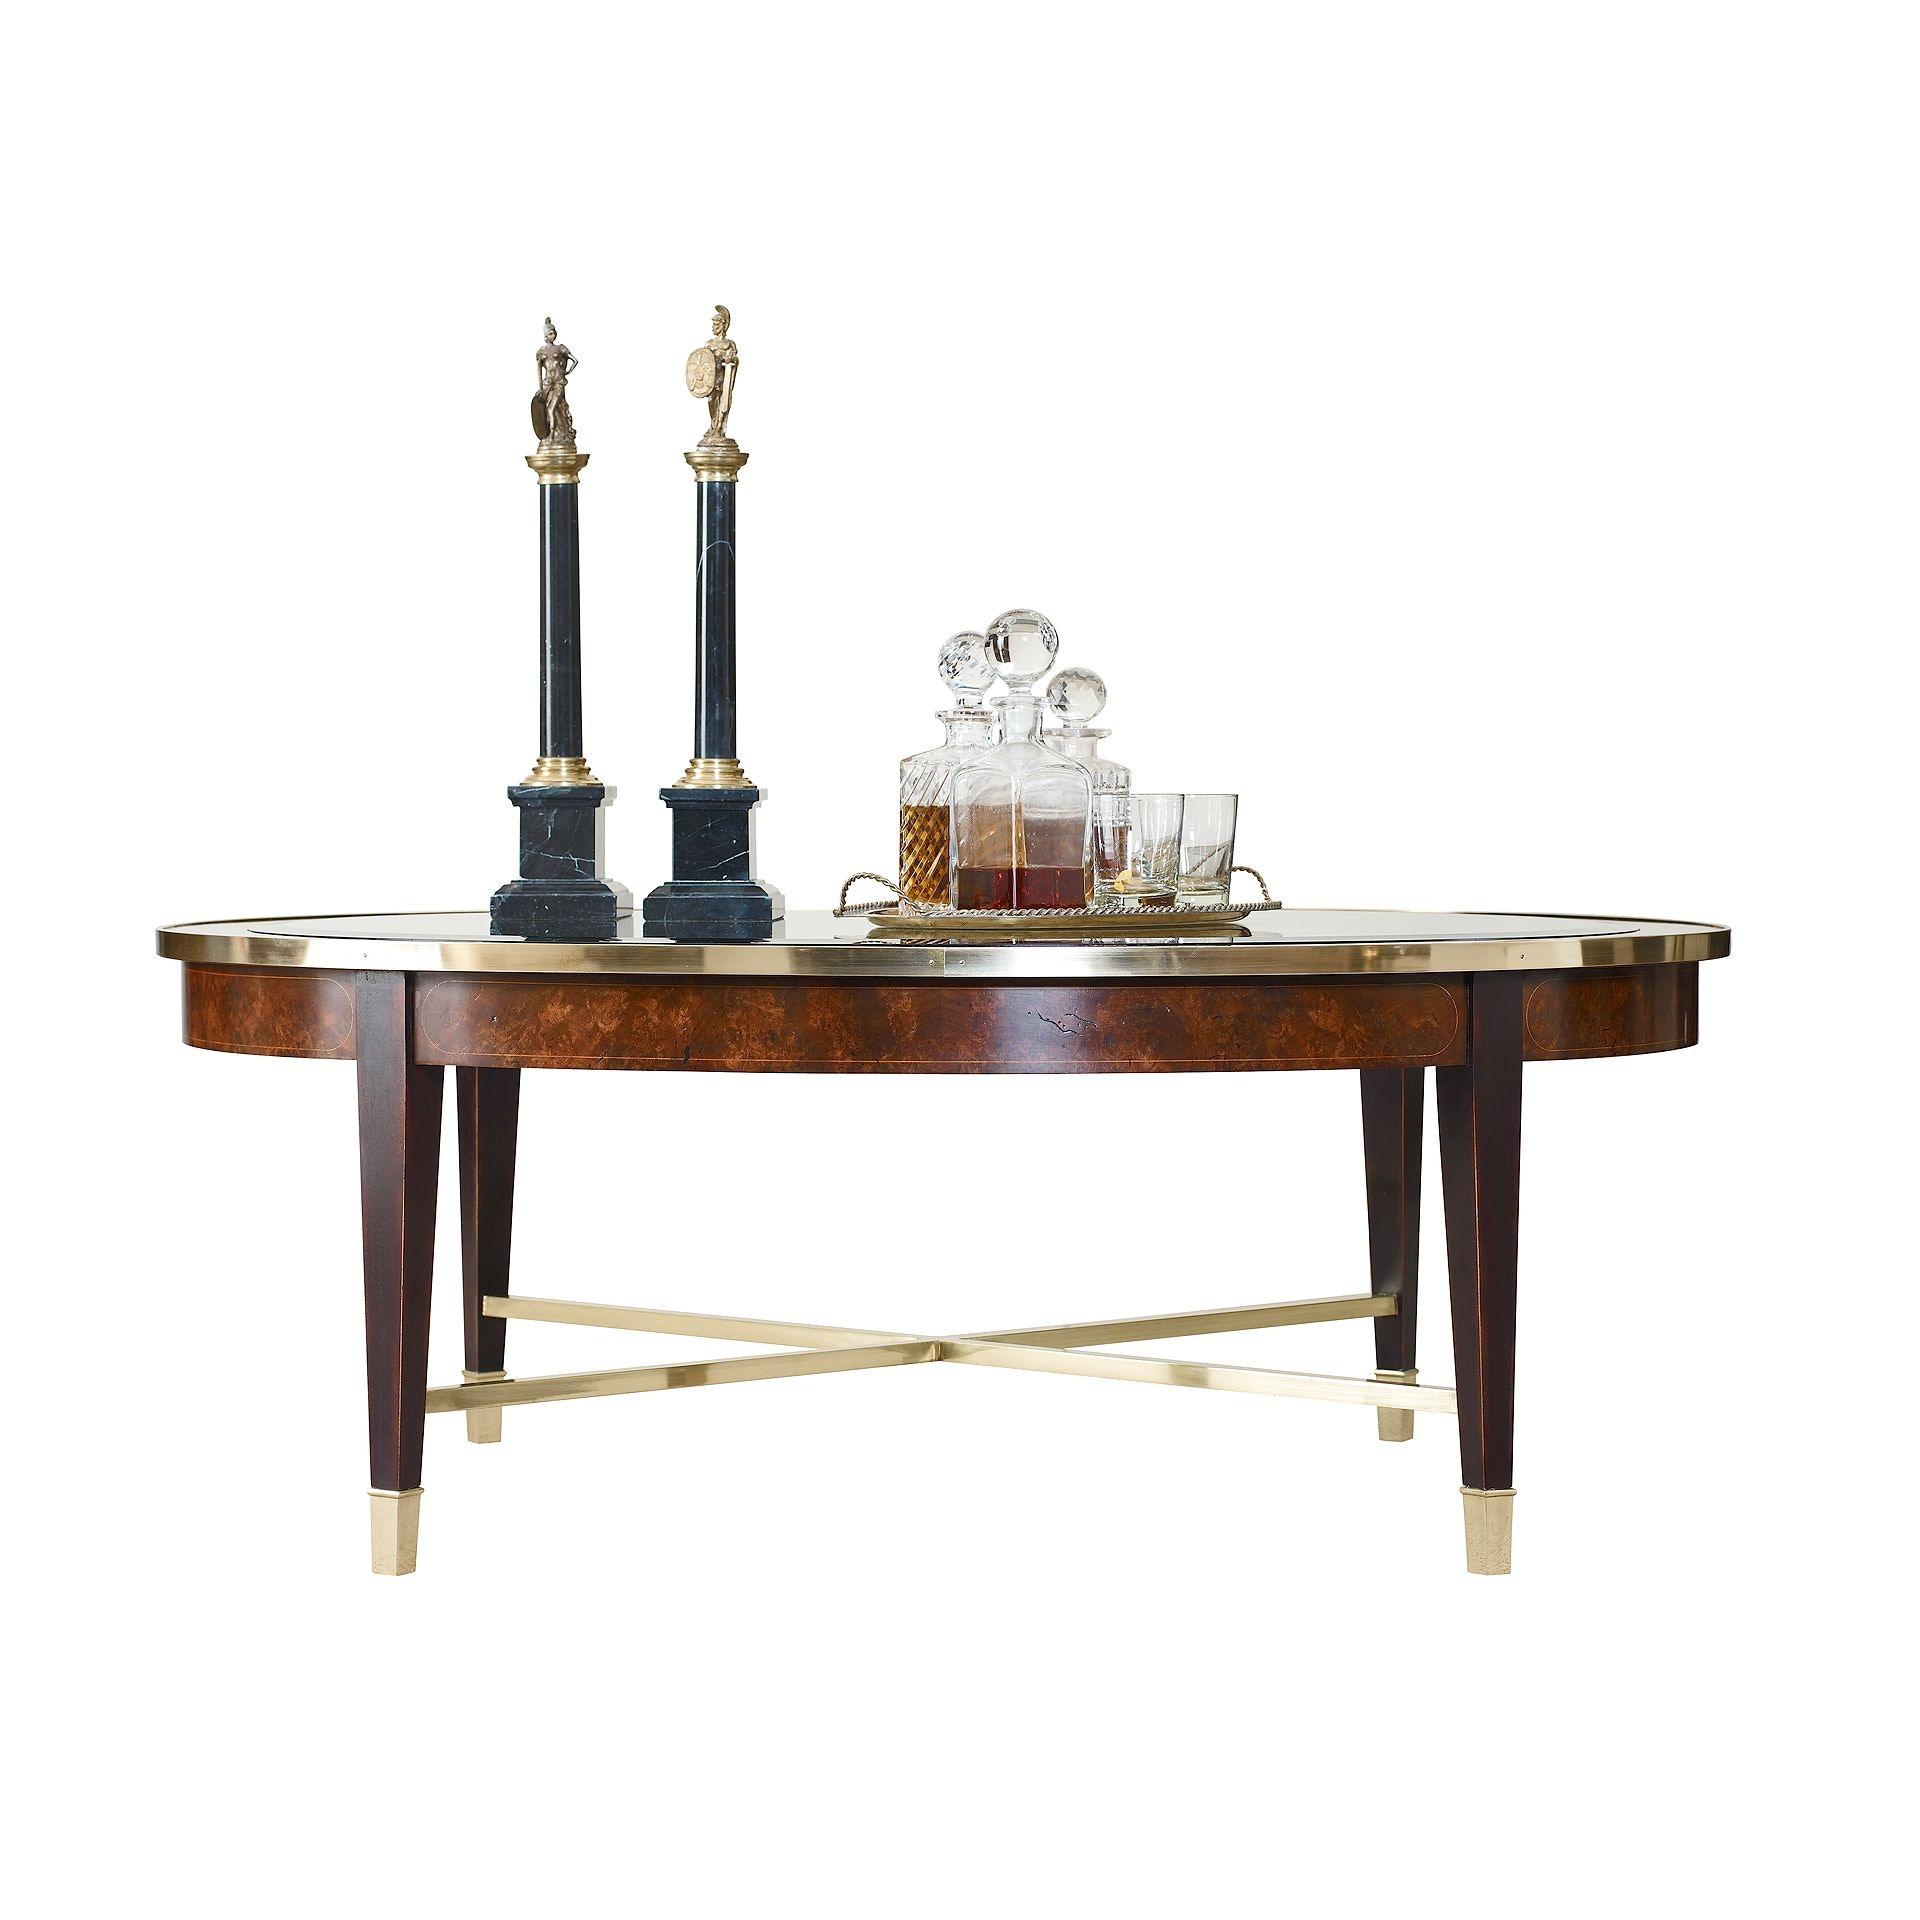 Henredon Furniture 280040G Living Room Crossroads Oval Cocktail Table